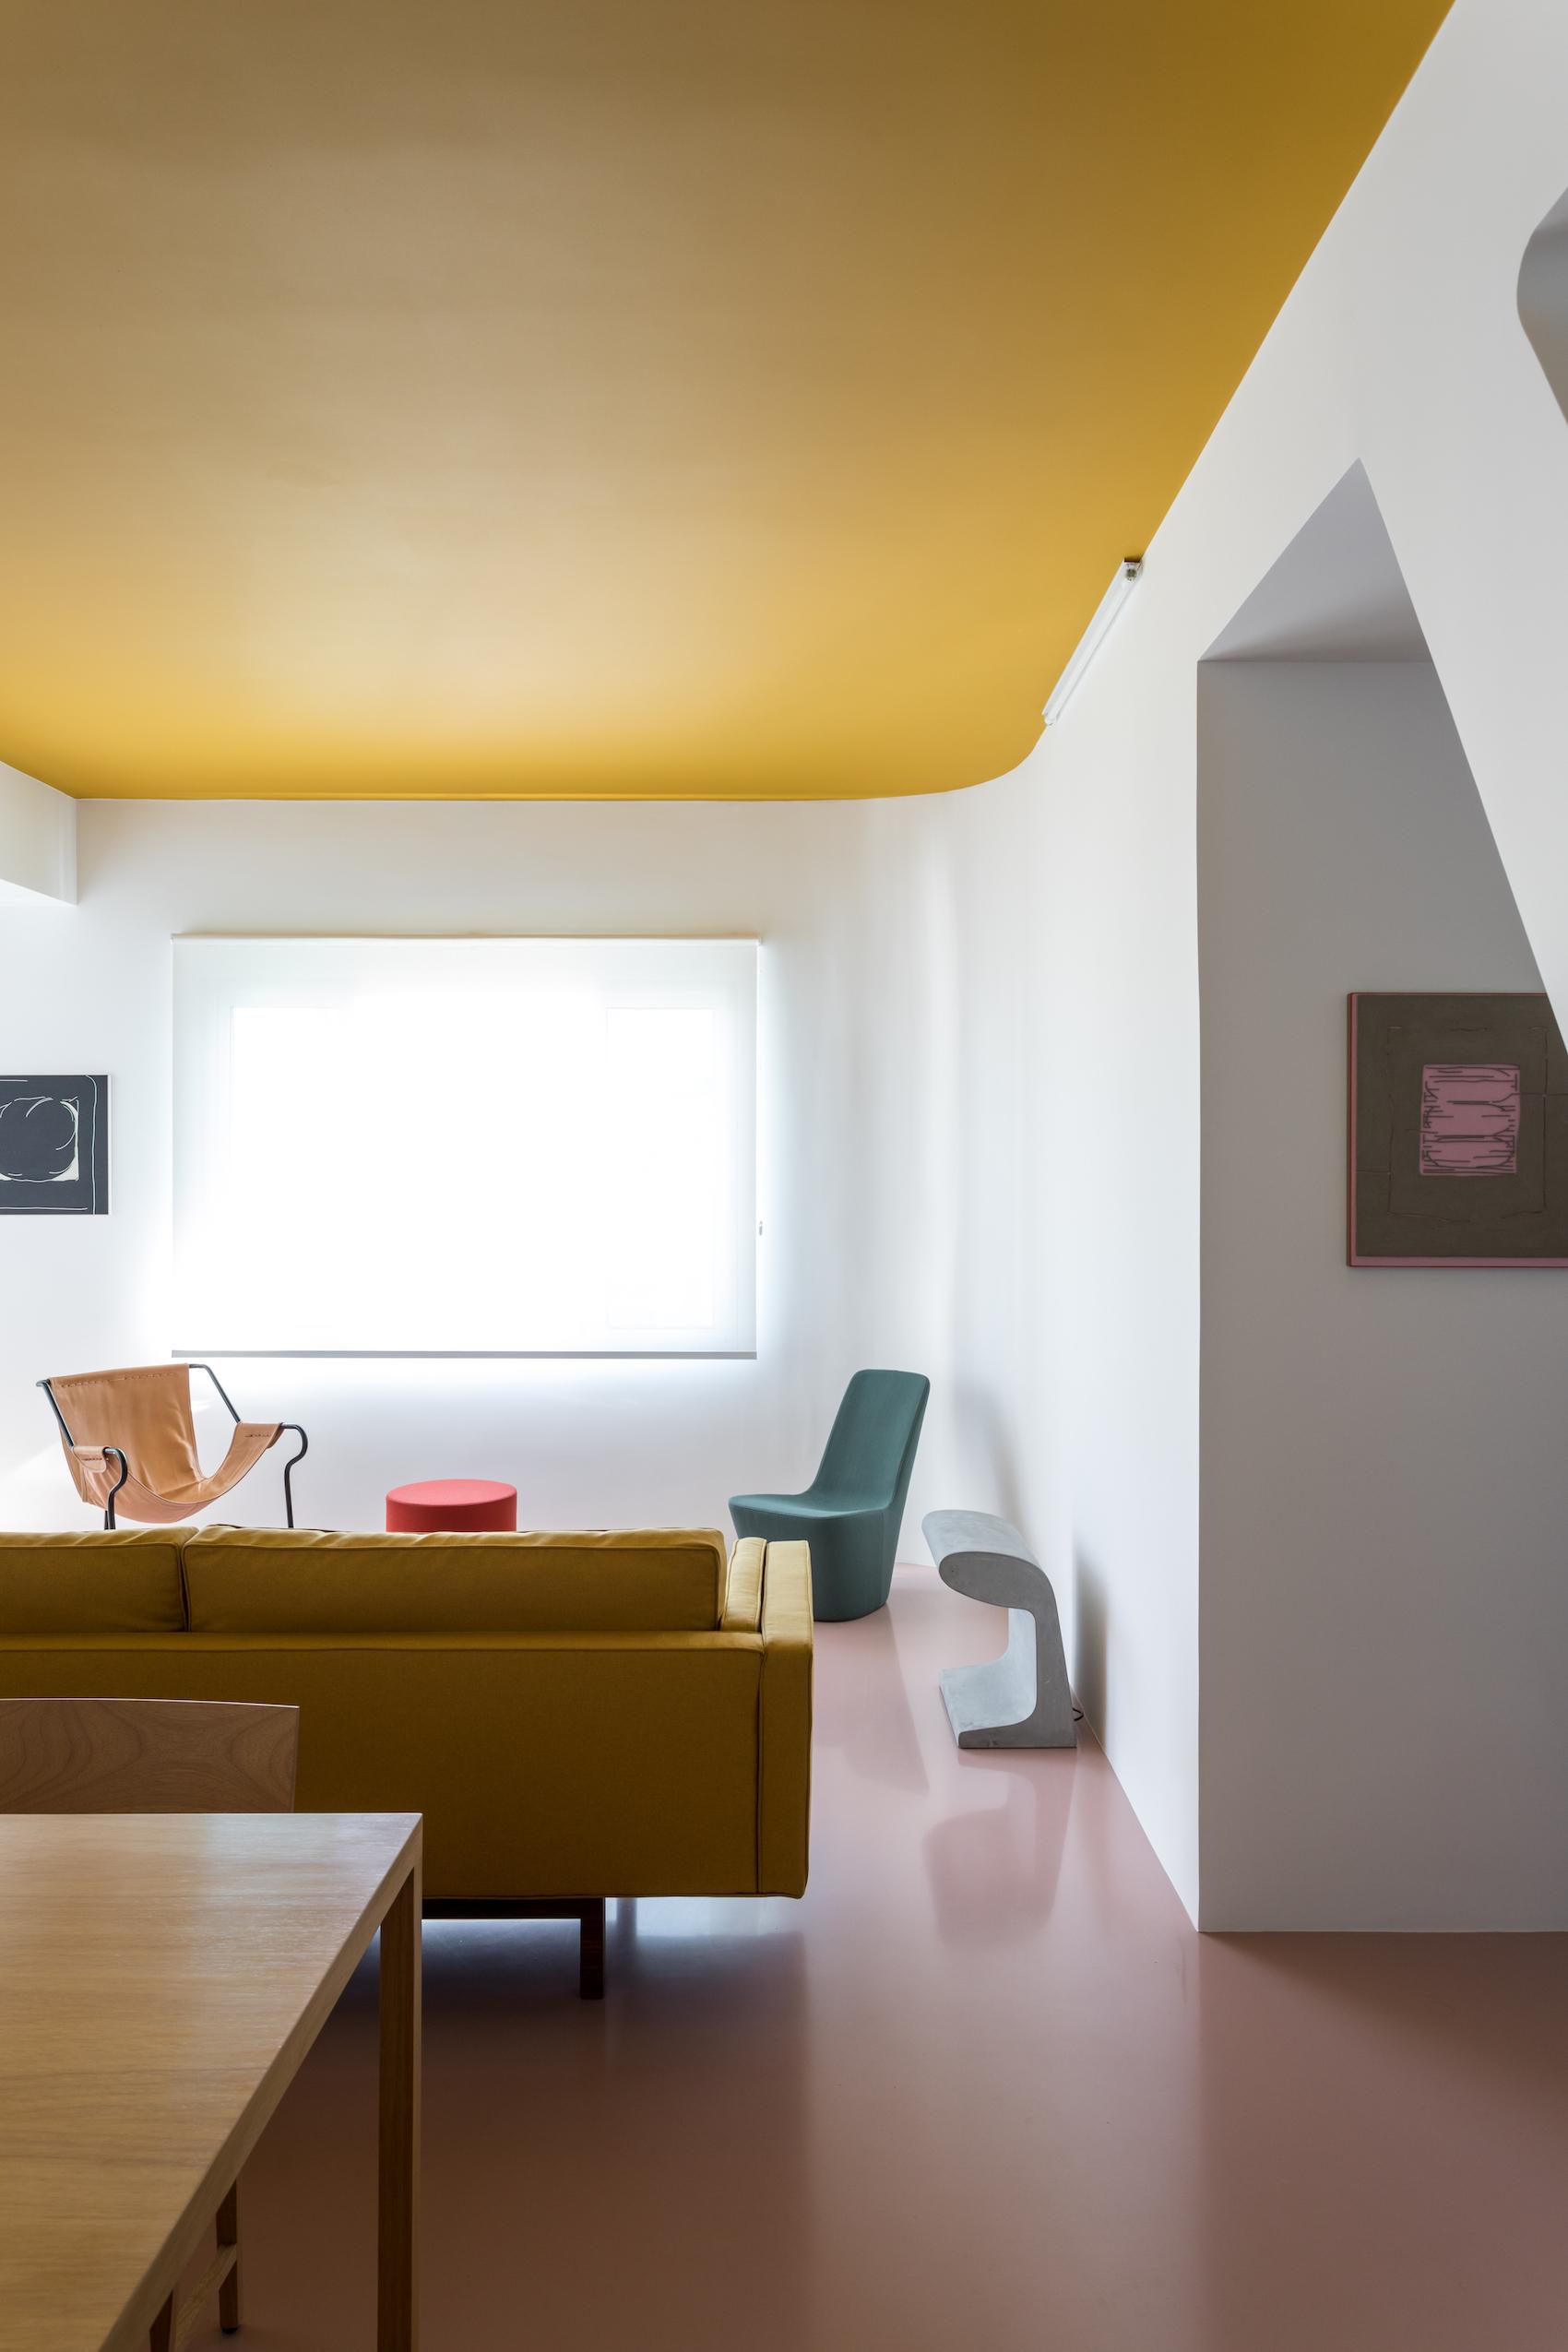 Apartmento Cass in São Paulo, Brazil by Felipe Hess